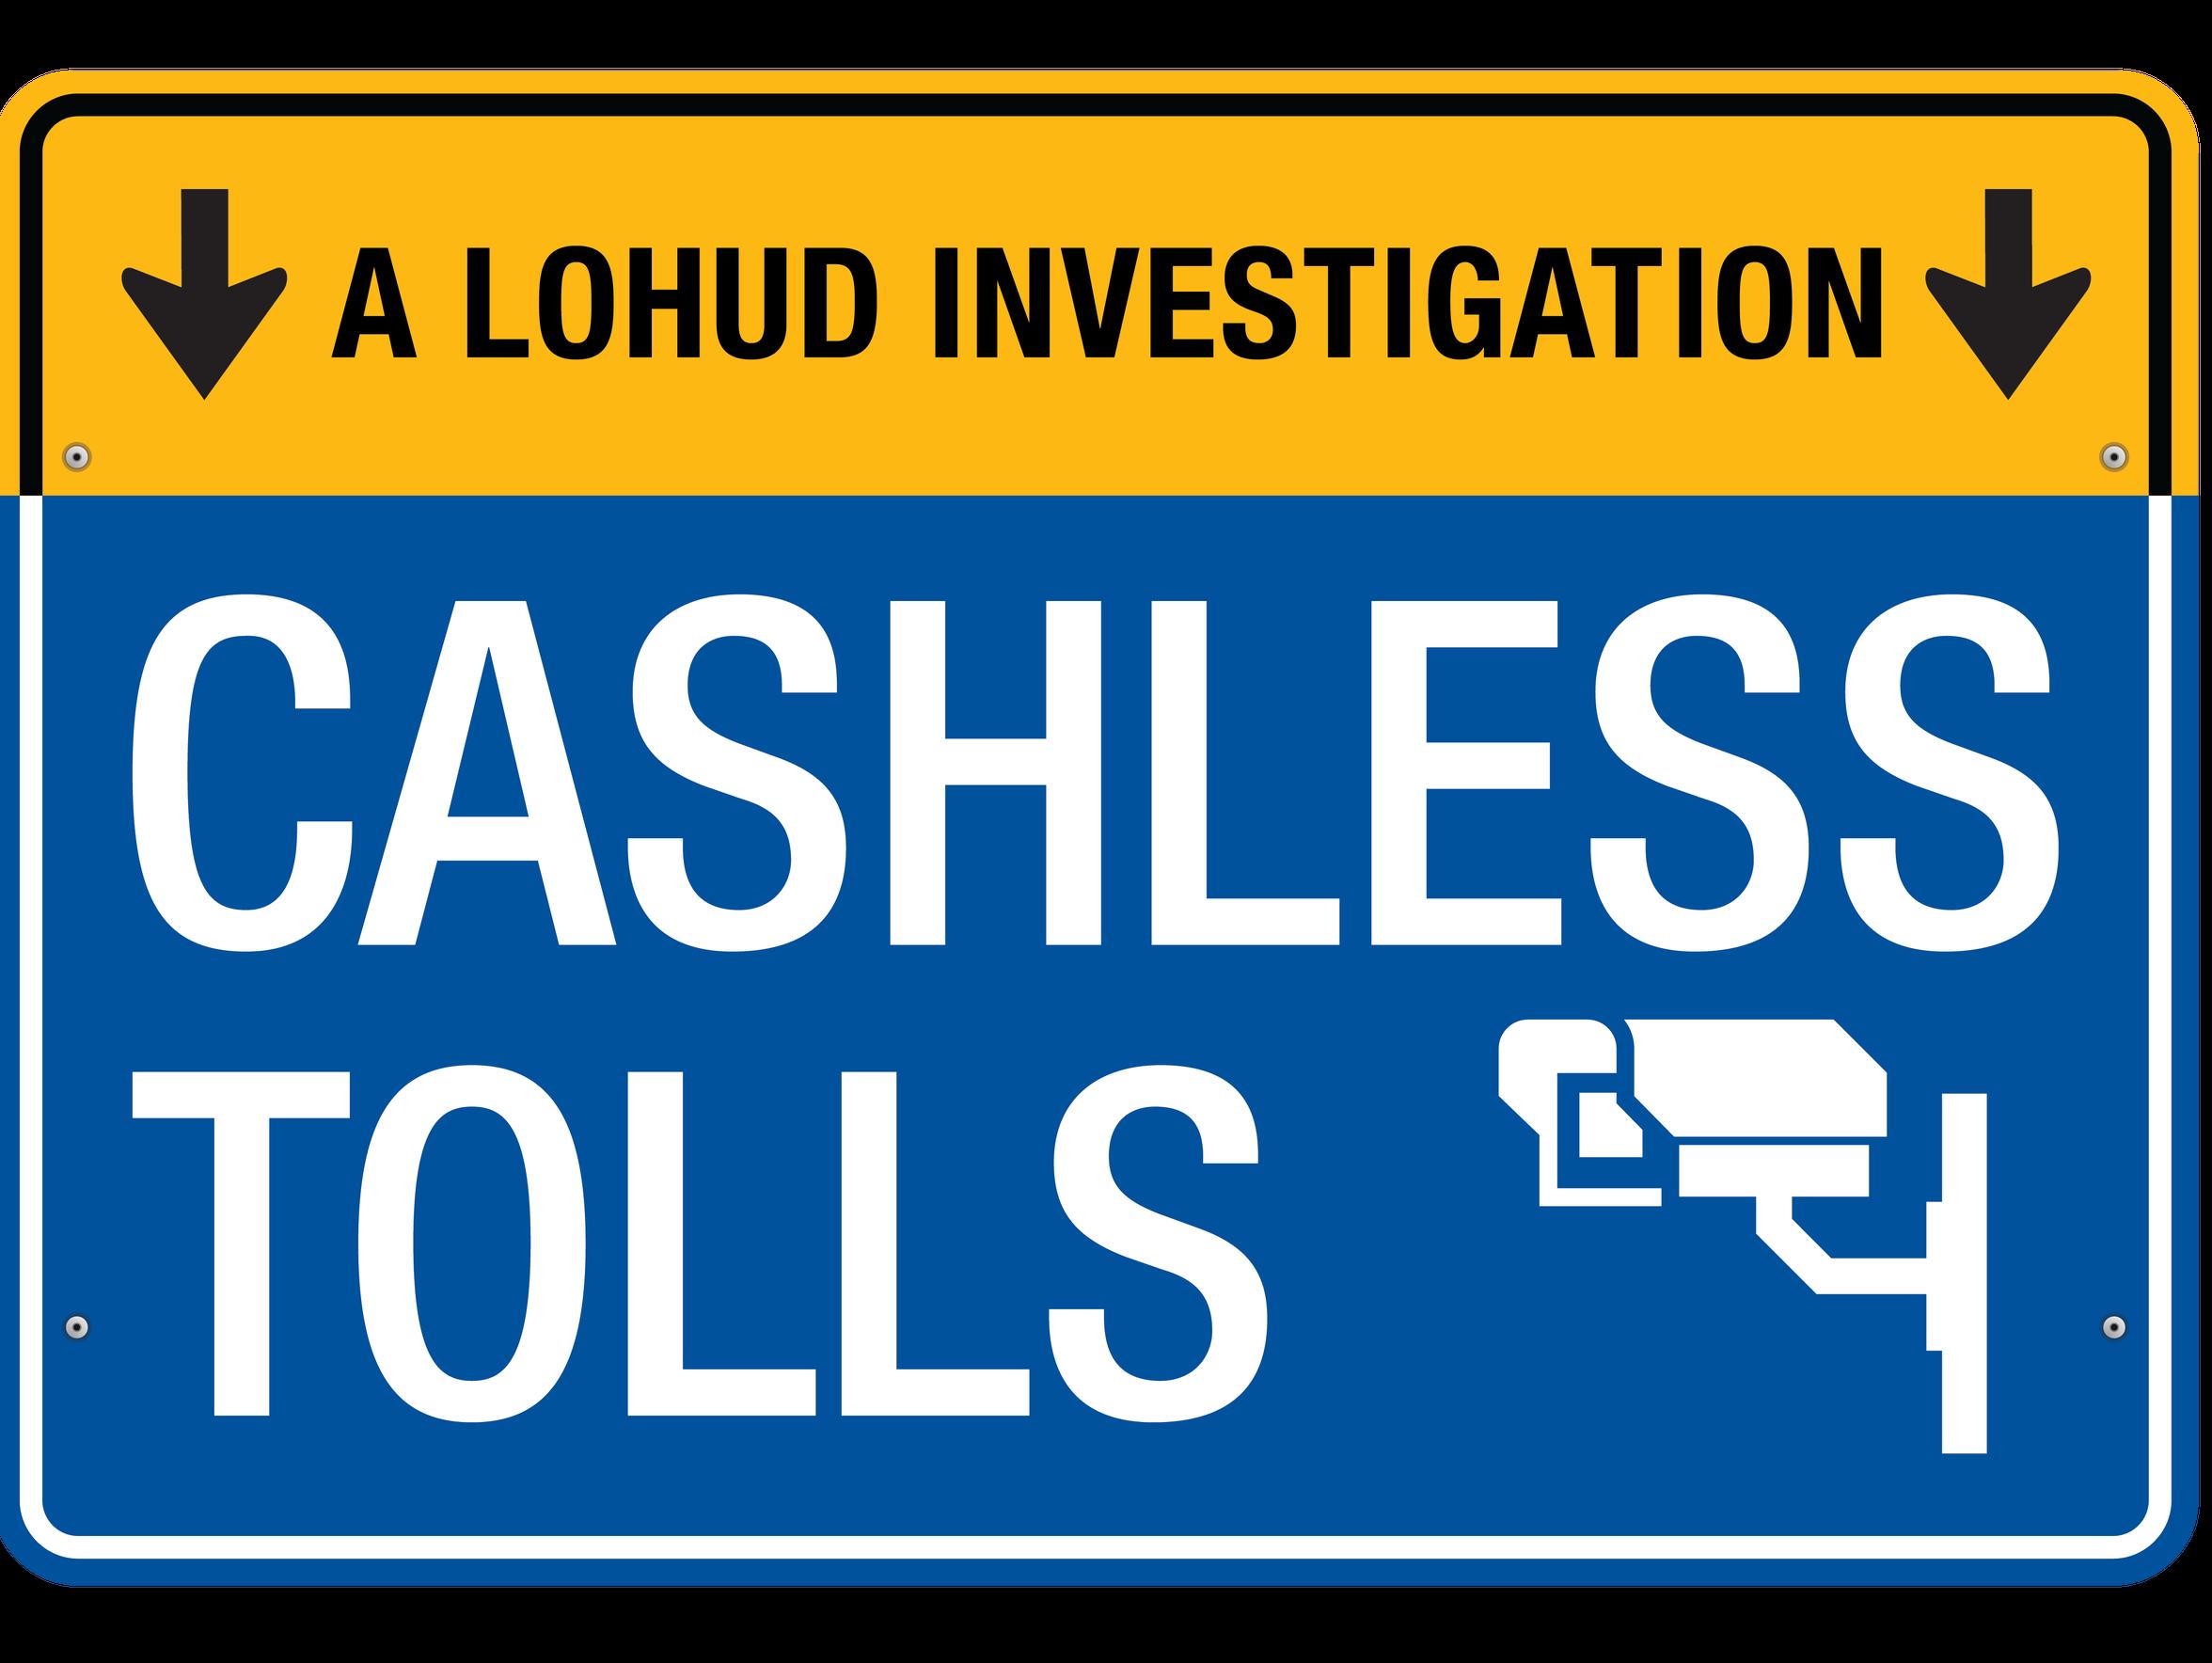 Cashless tolls: A lohud investigation